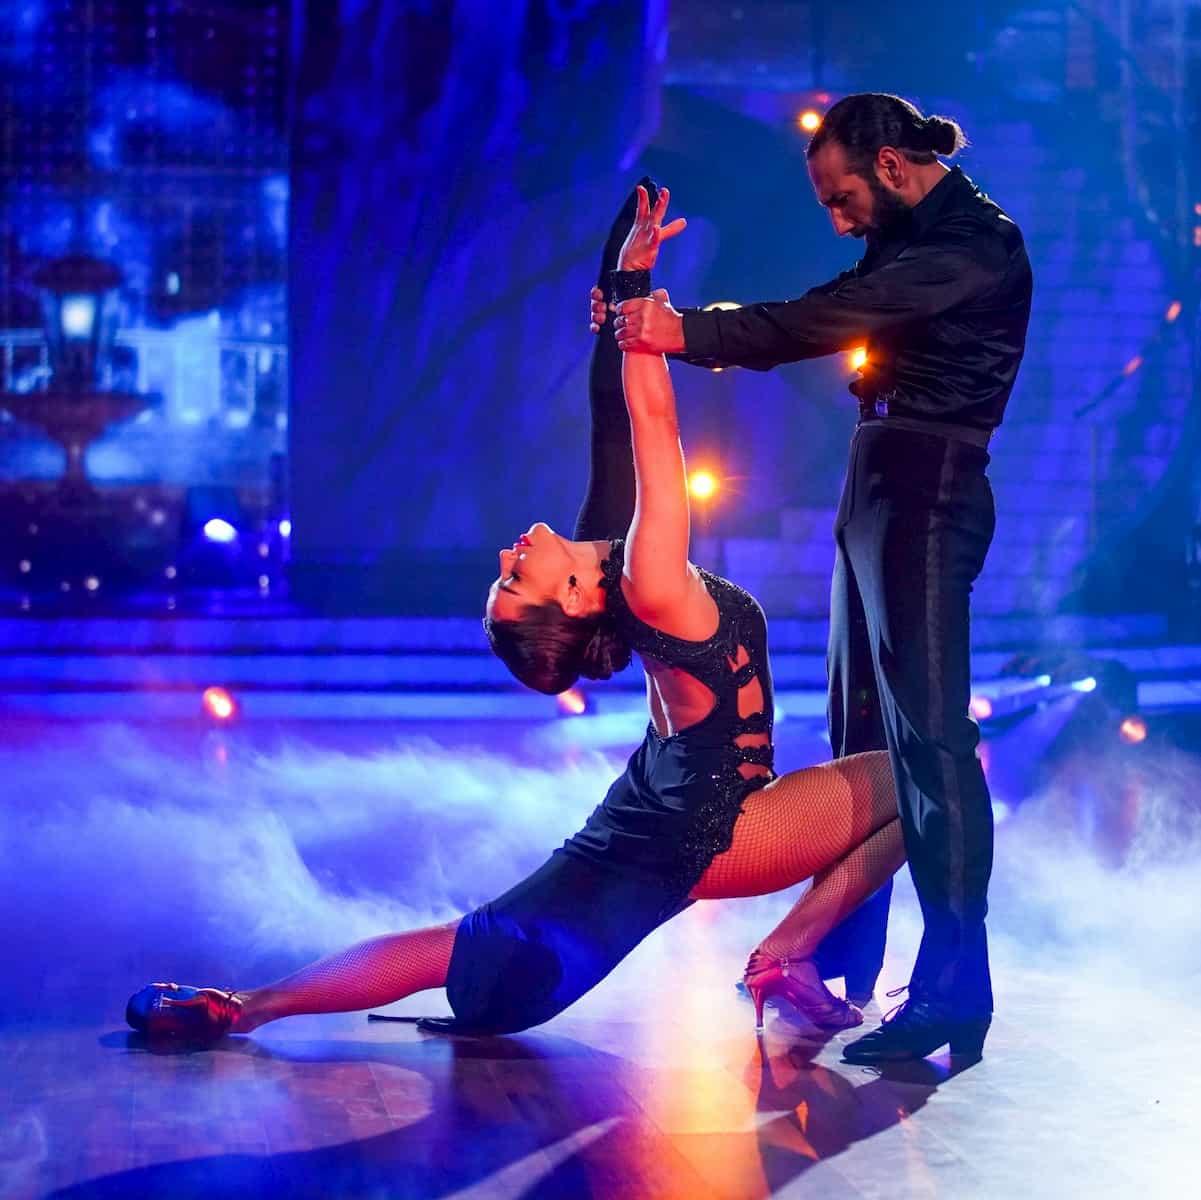 Lili Paul-Roncalli und Massimo Sinato bei Let's dance 2020 am 28.2.2020